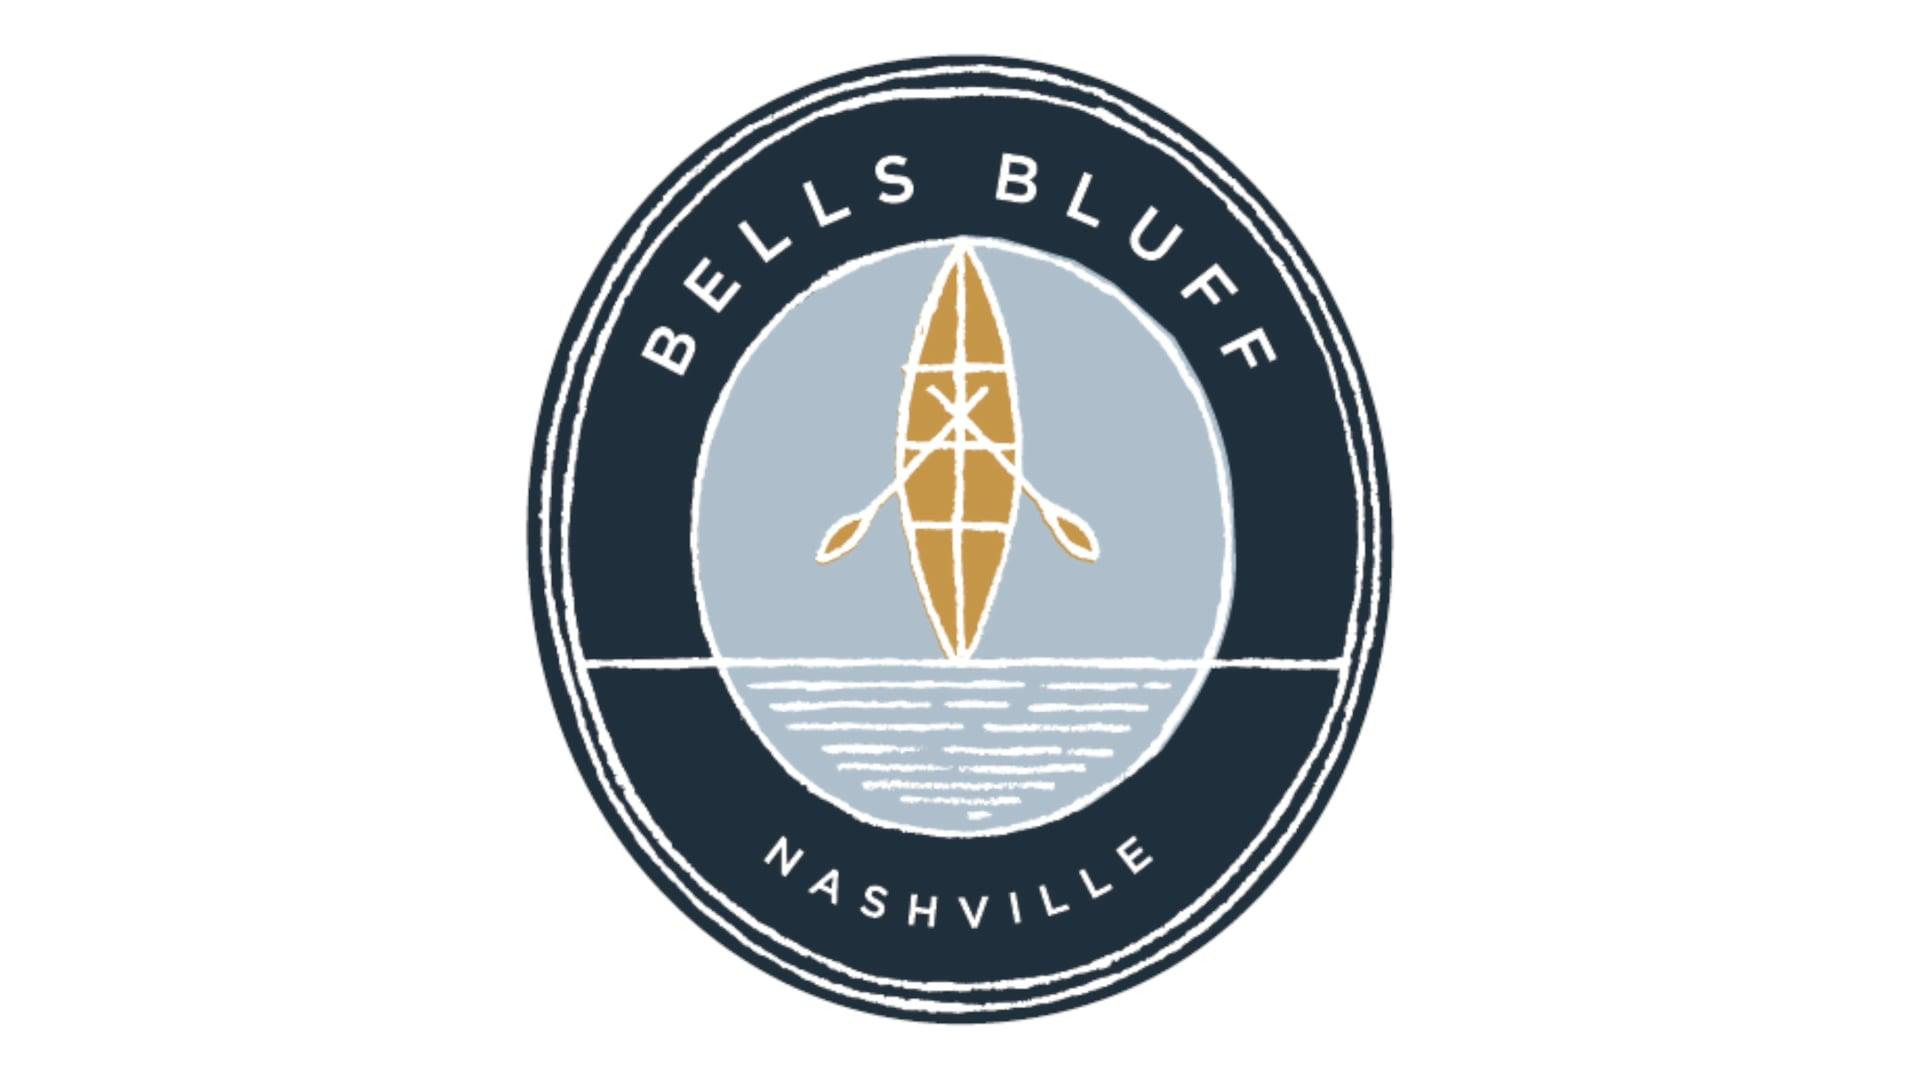 Bells Bluff - Nashville, TN